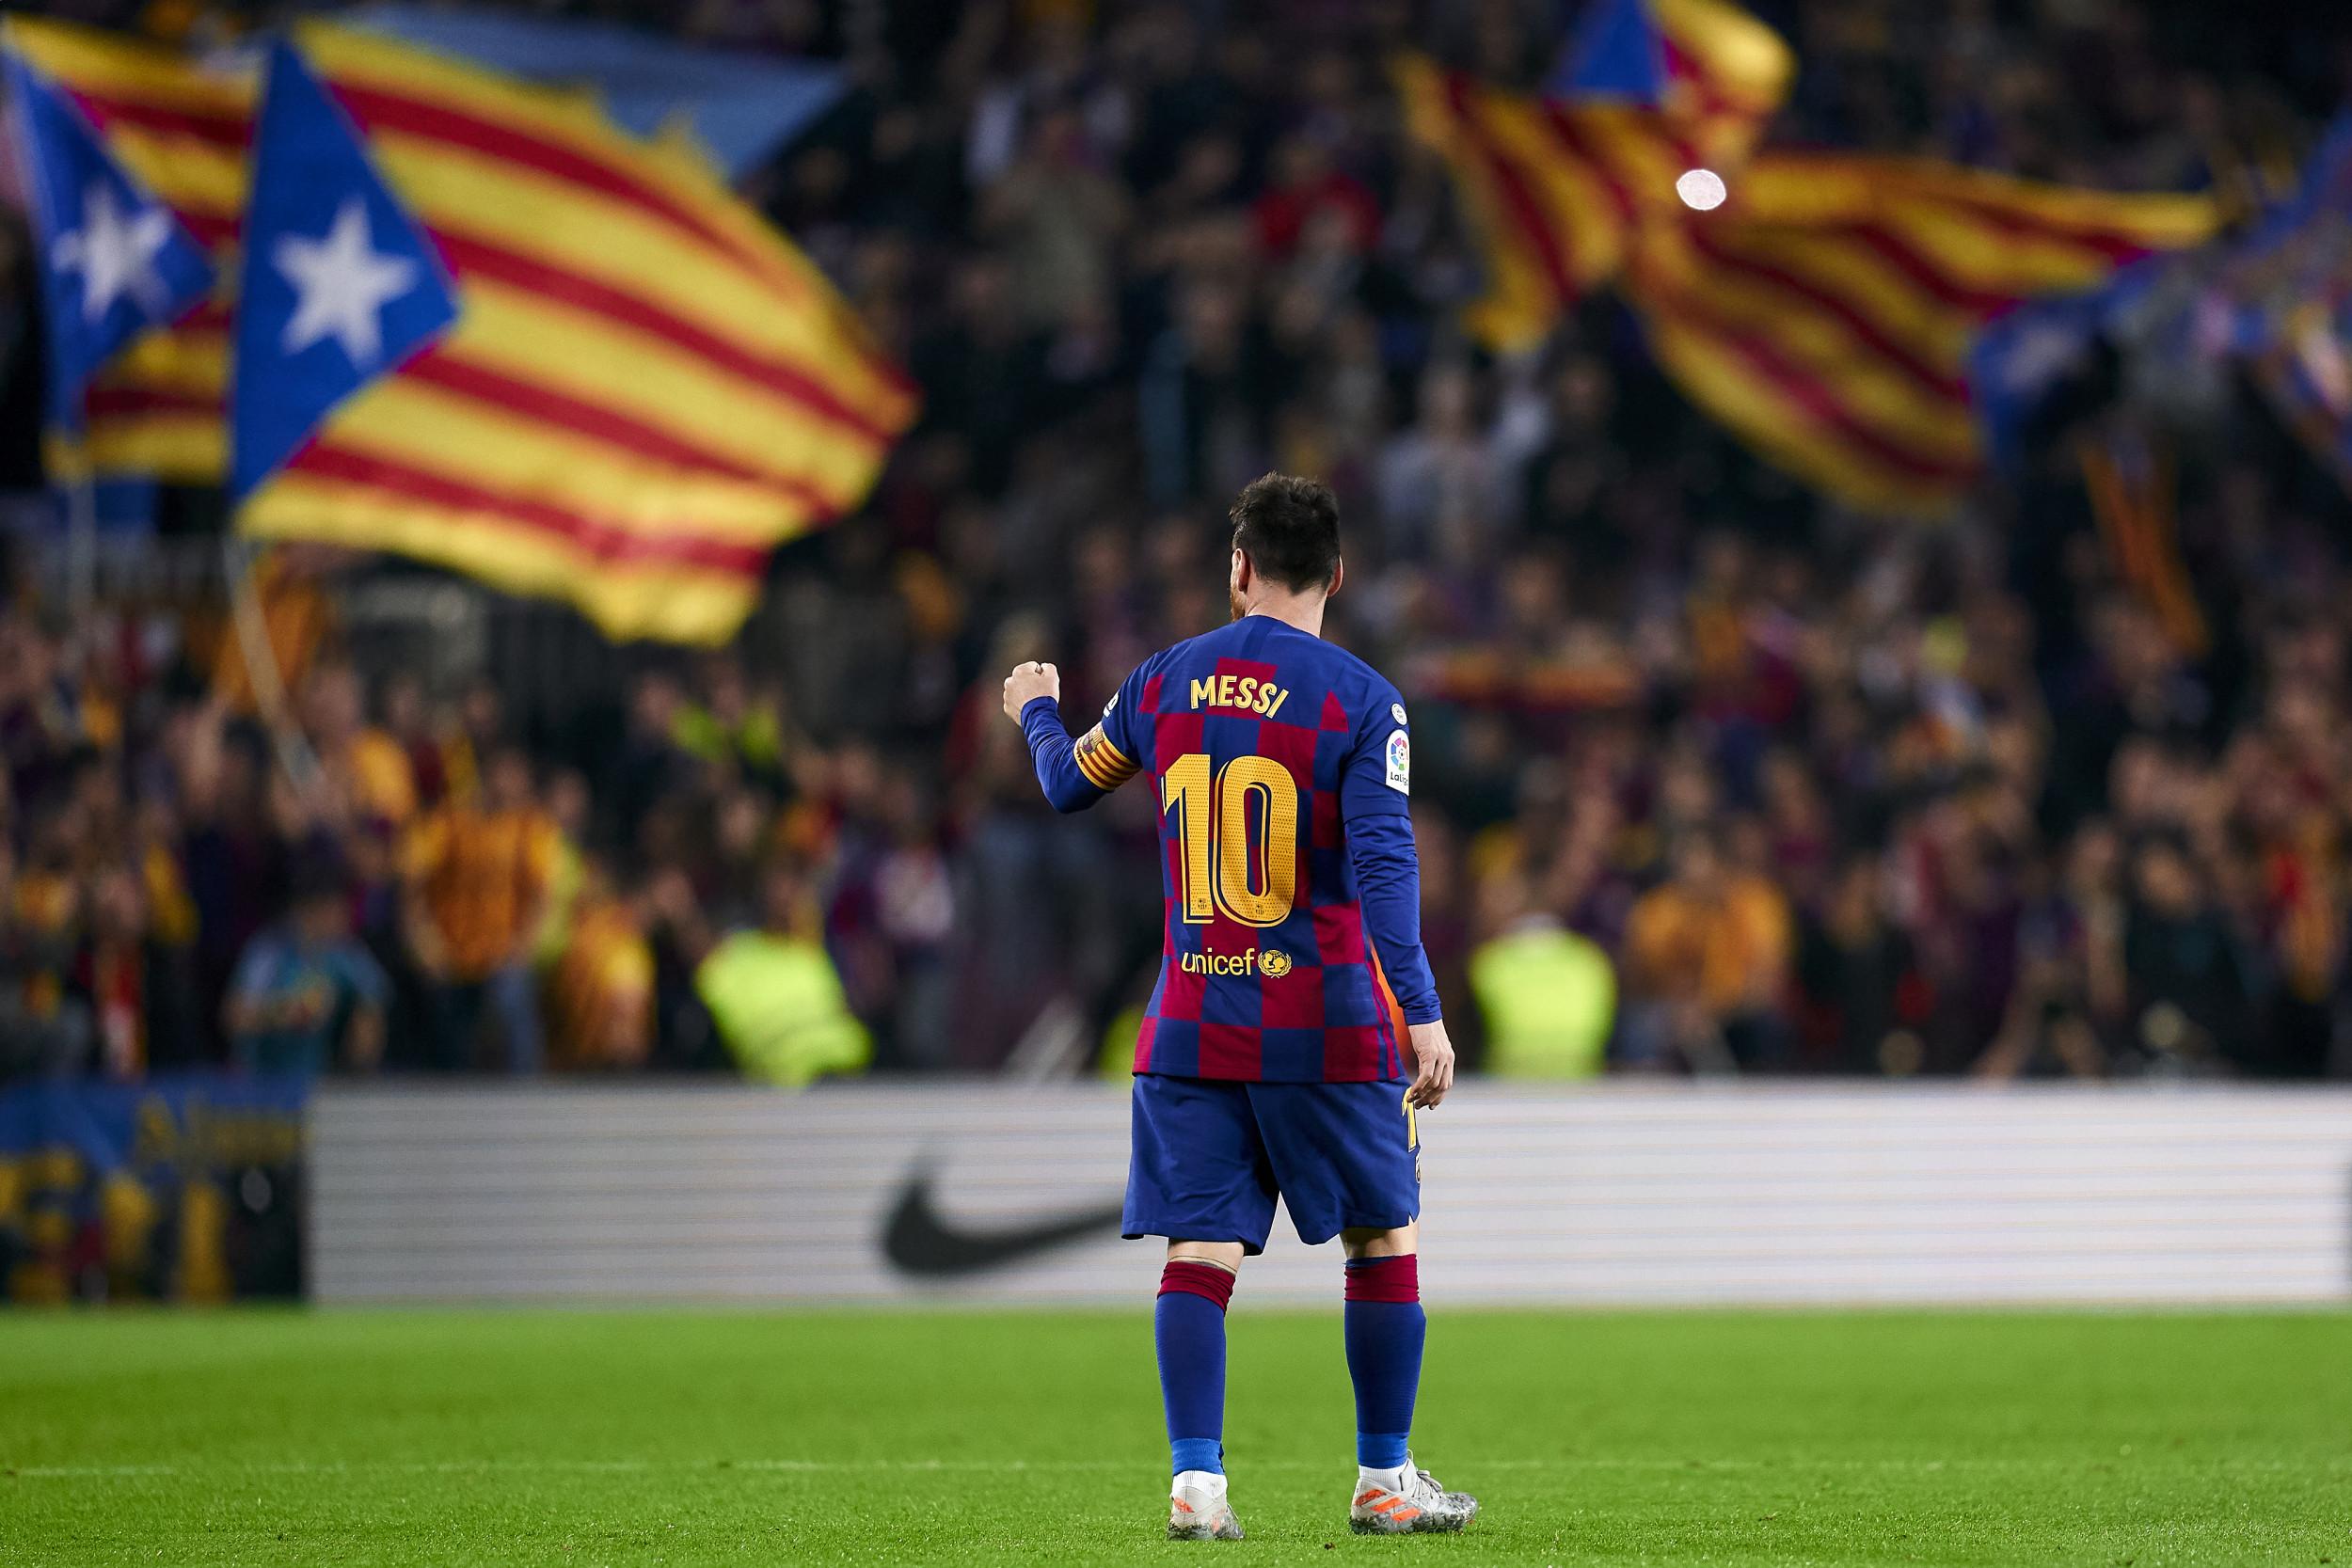 Levante vs. Barcelona: Where to watch La Liga, TV channel, live stream, team news and odds